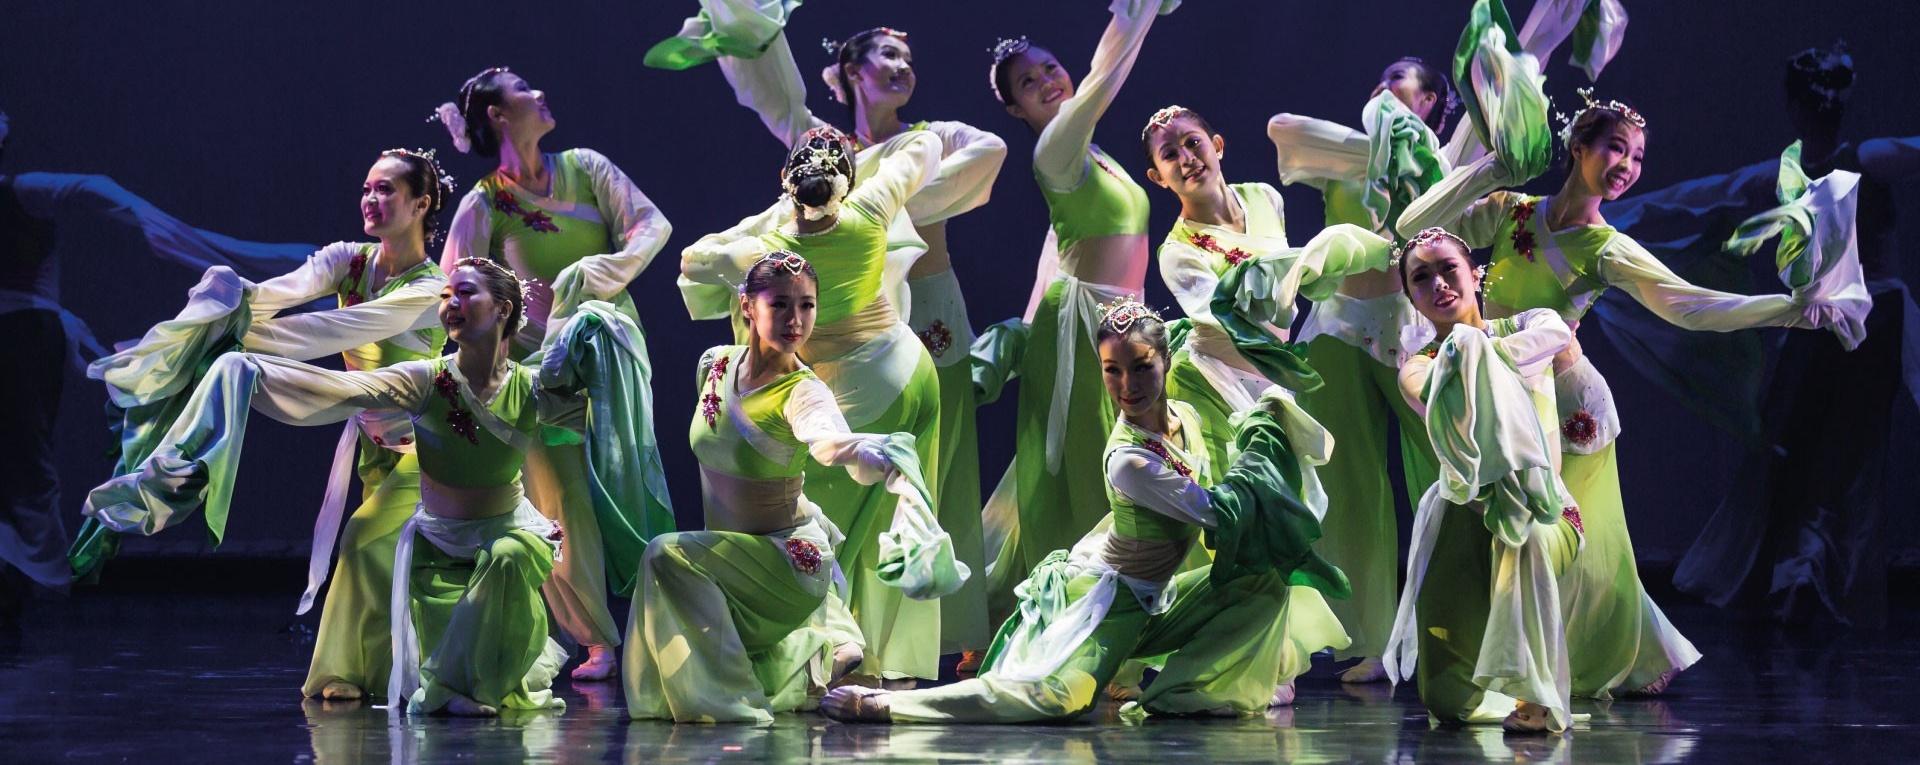 Huayi 2018 - Revelry in Spring